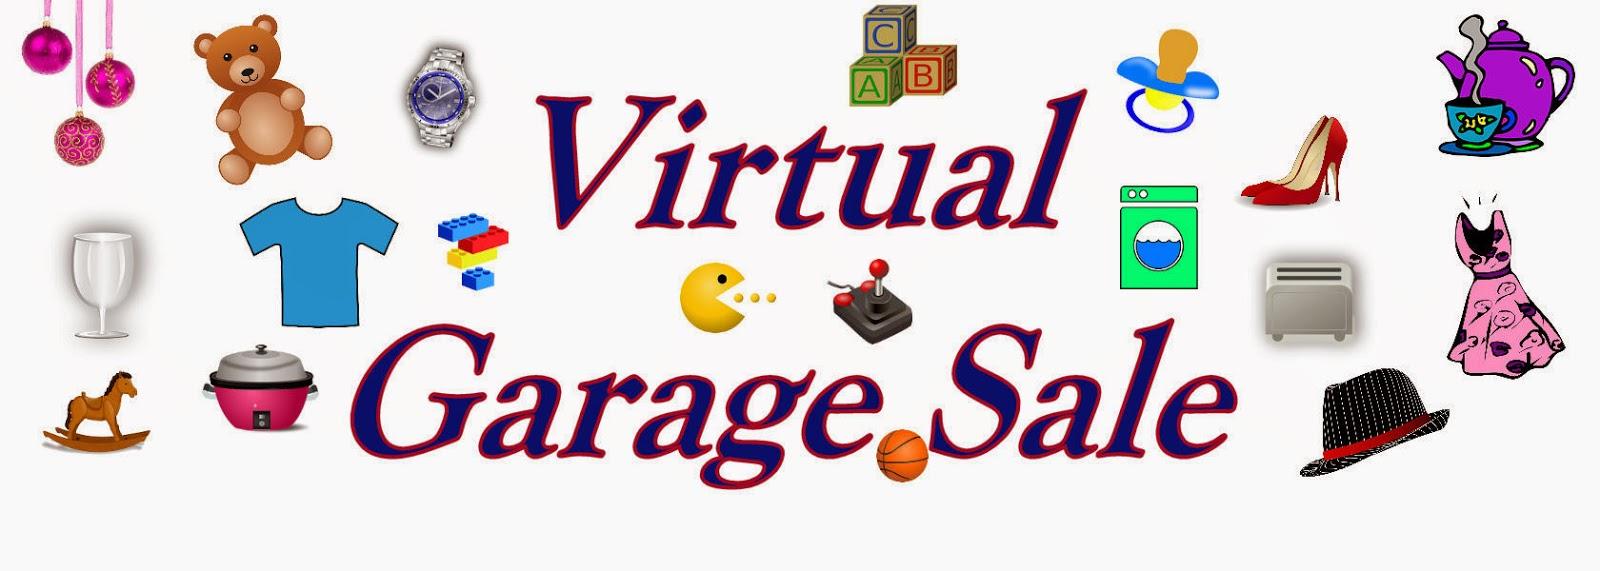 Virtual Garage Sale